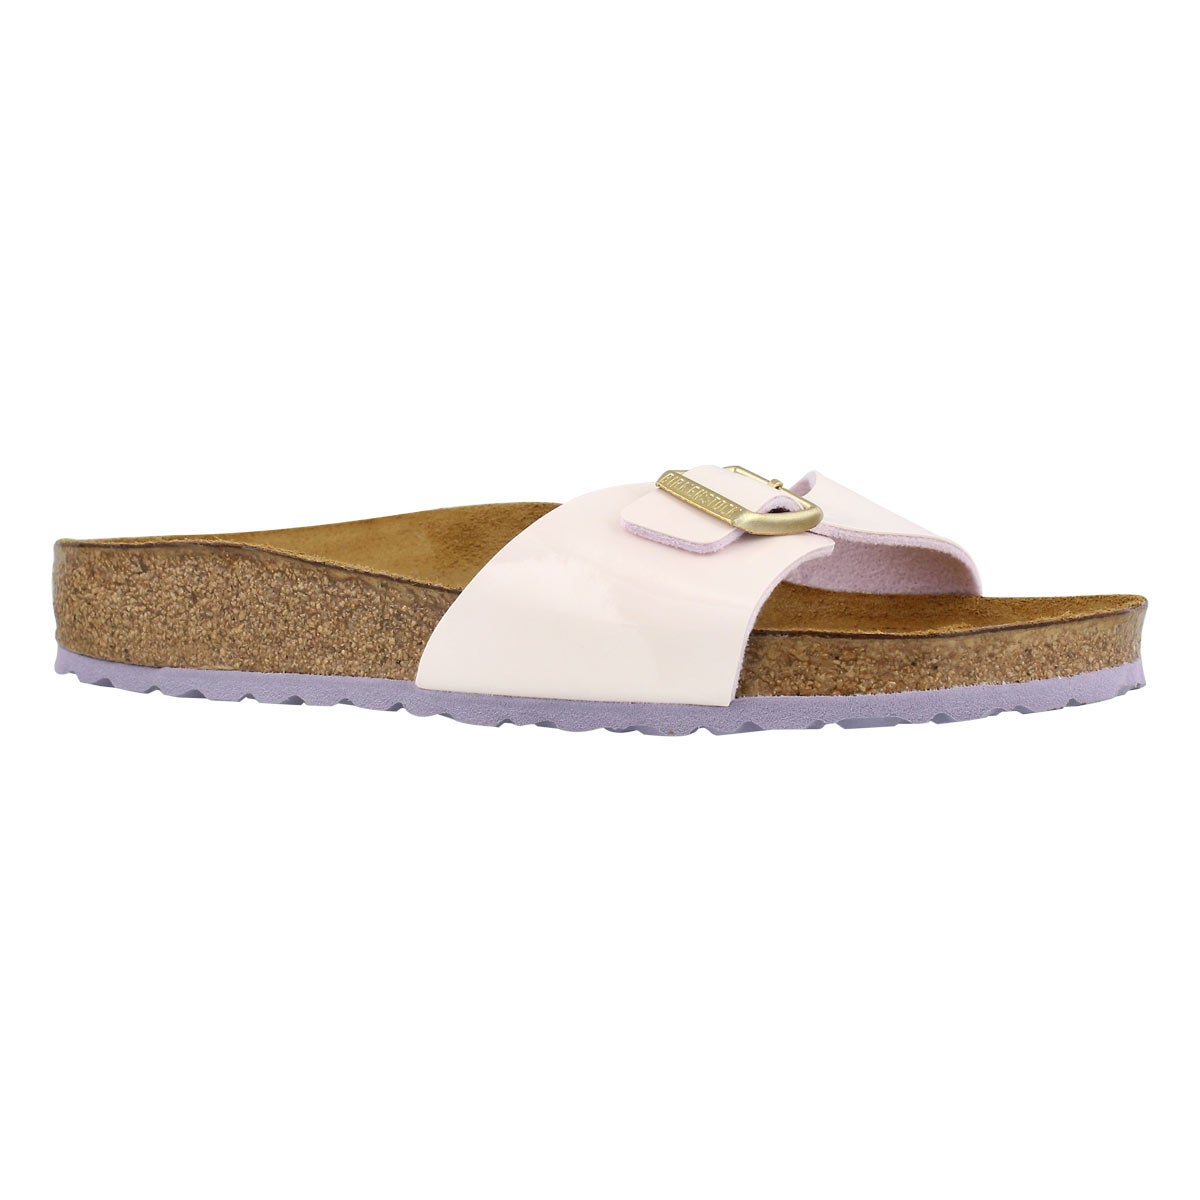 Women's MADRID BF crm pnk pat sandals - Narrow